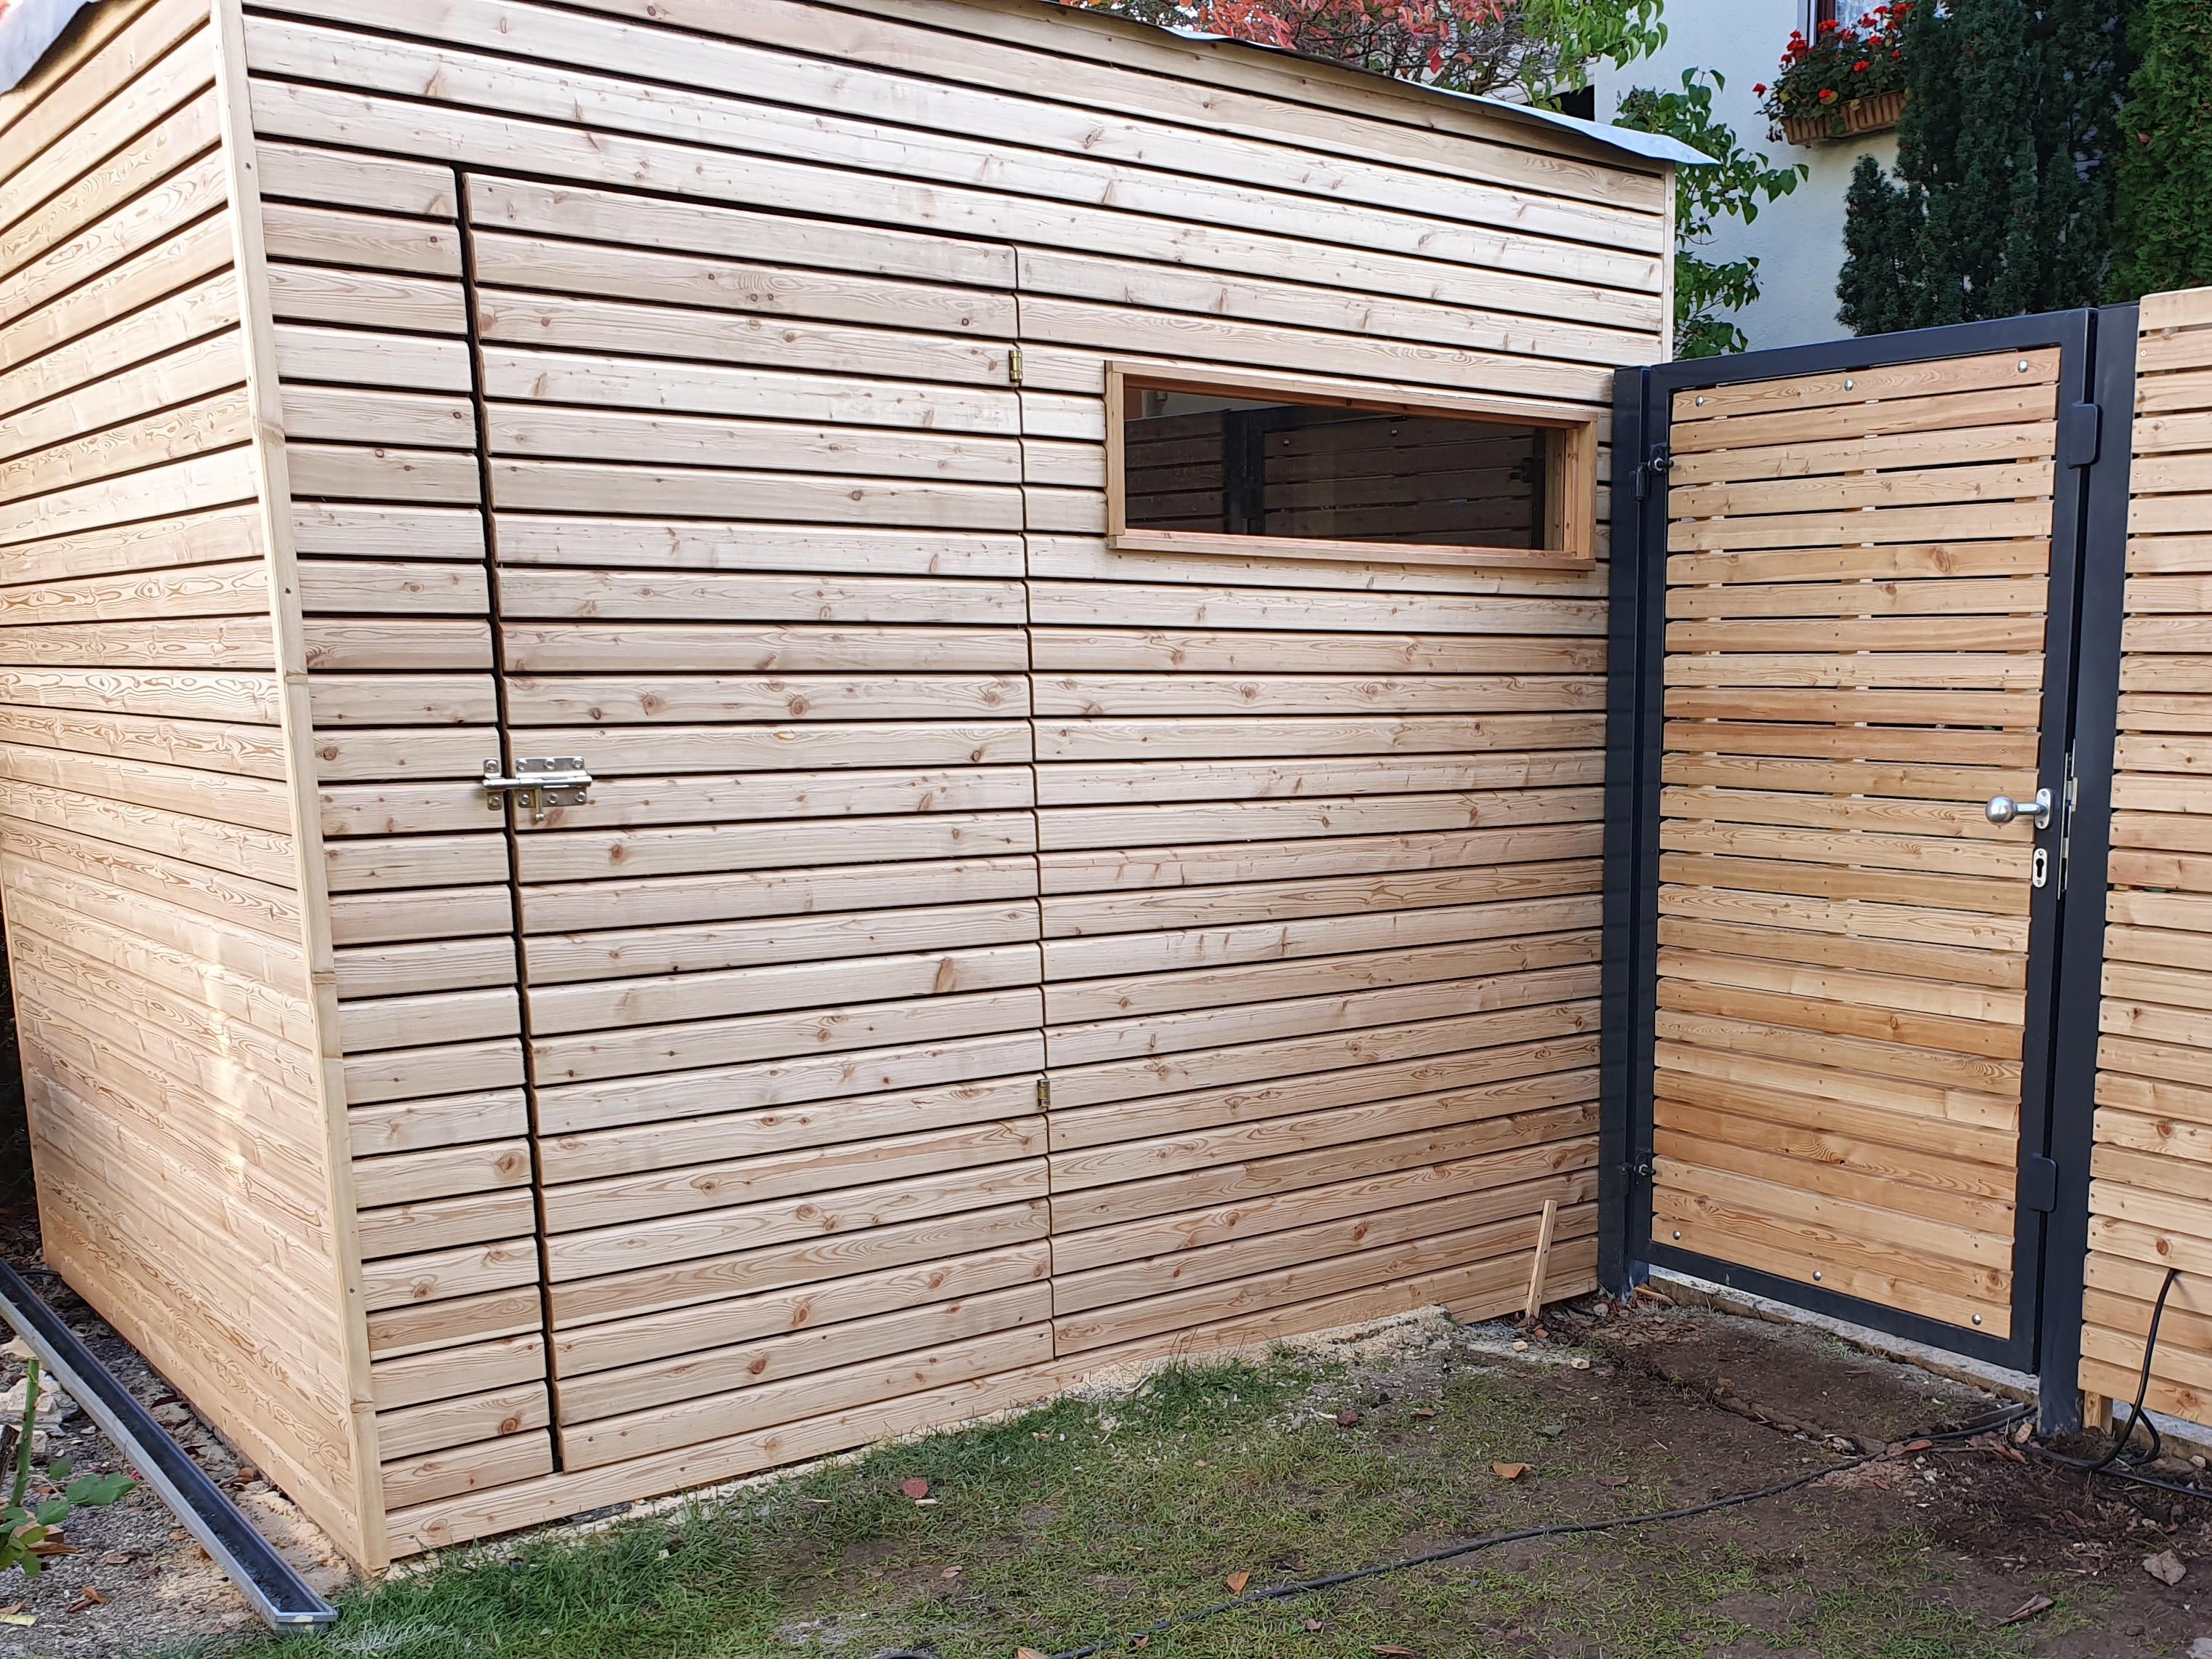 Gartenhaus Mit Zaun Plan Grun